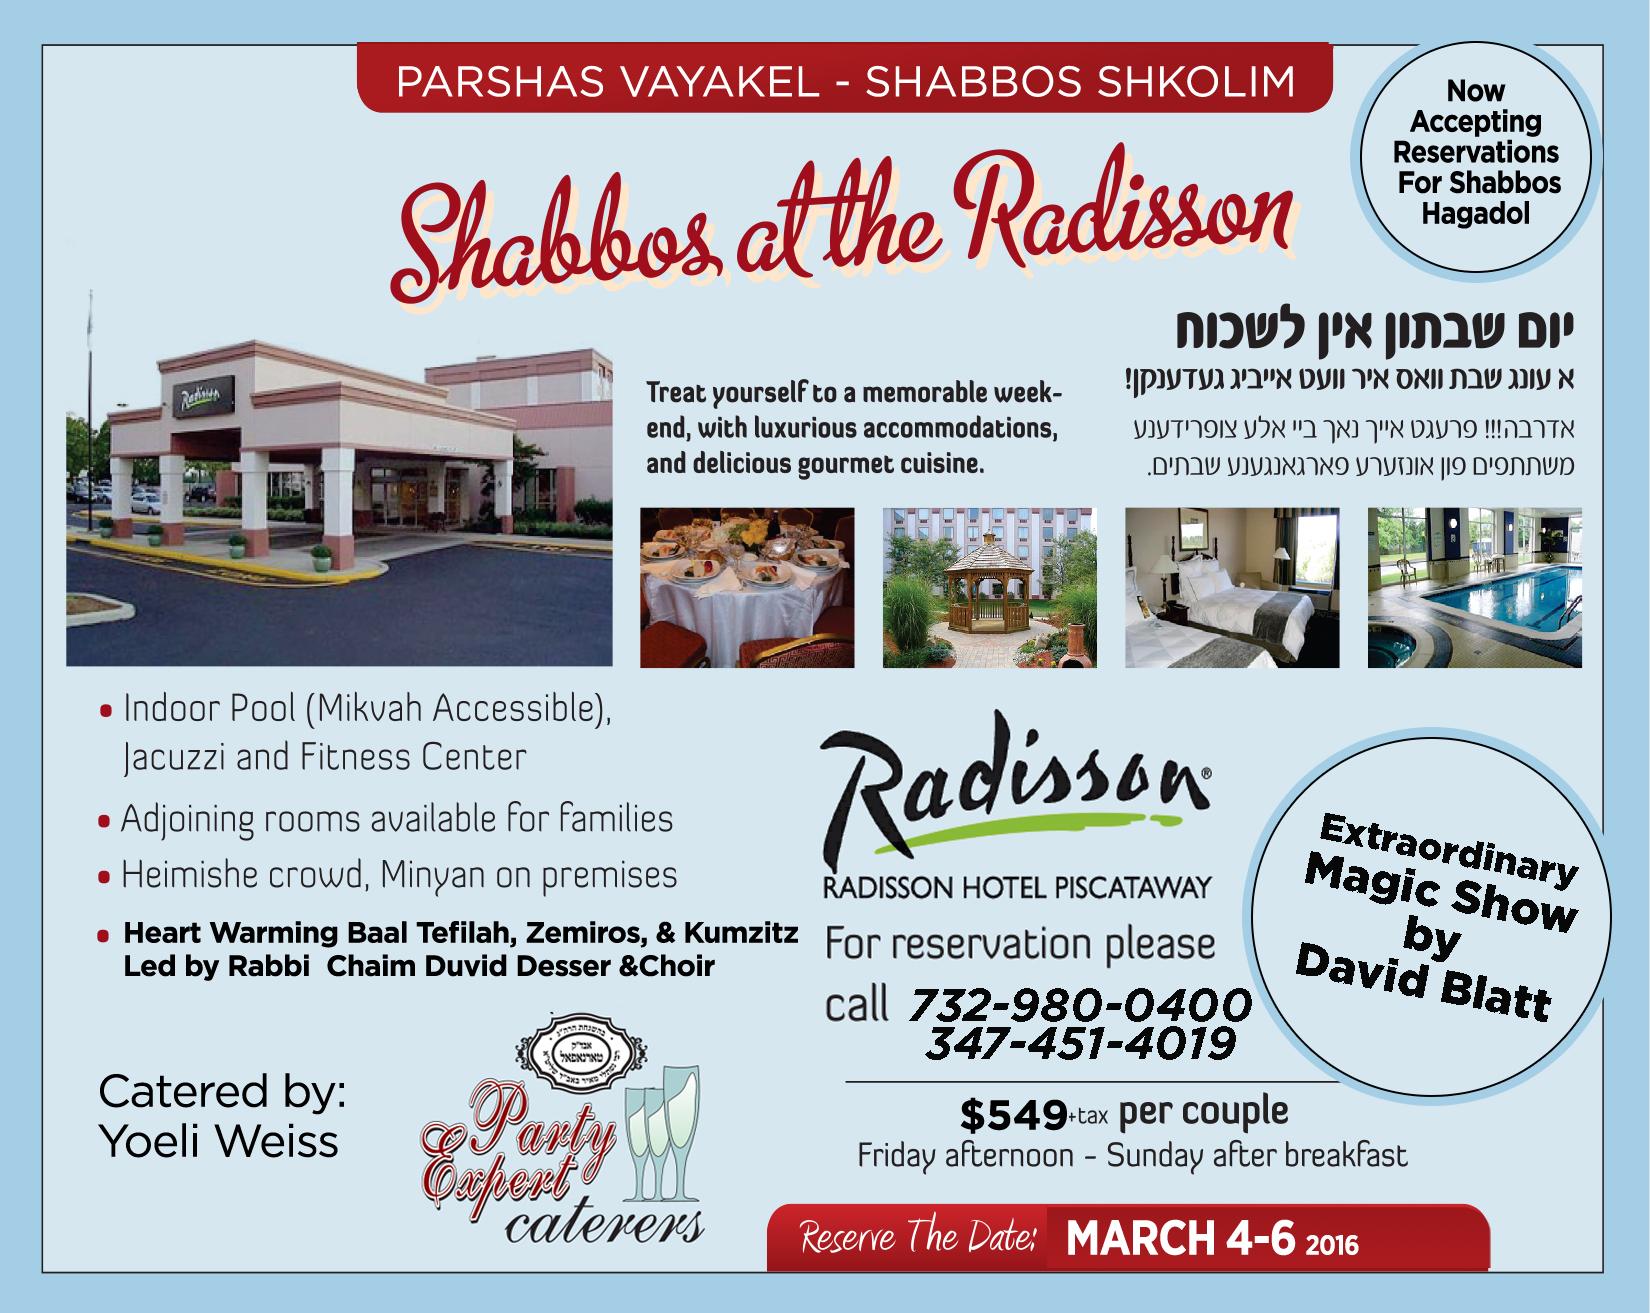 Shabbos Shkolim 2016 at the Radisson Hotel in Piscataway, NJ